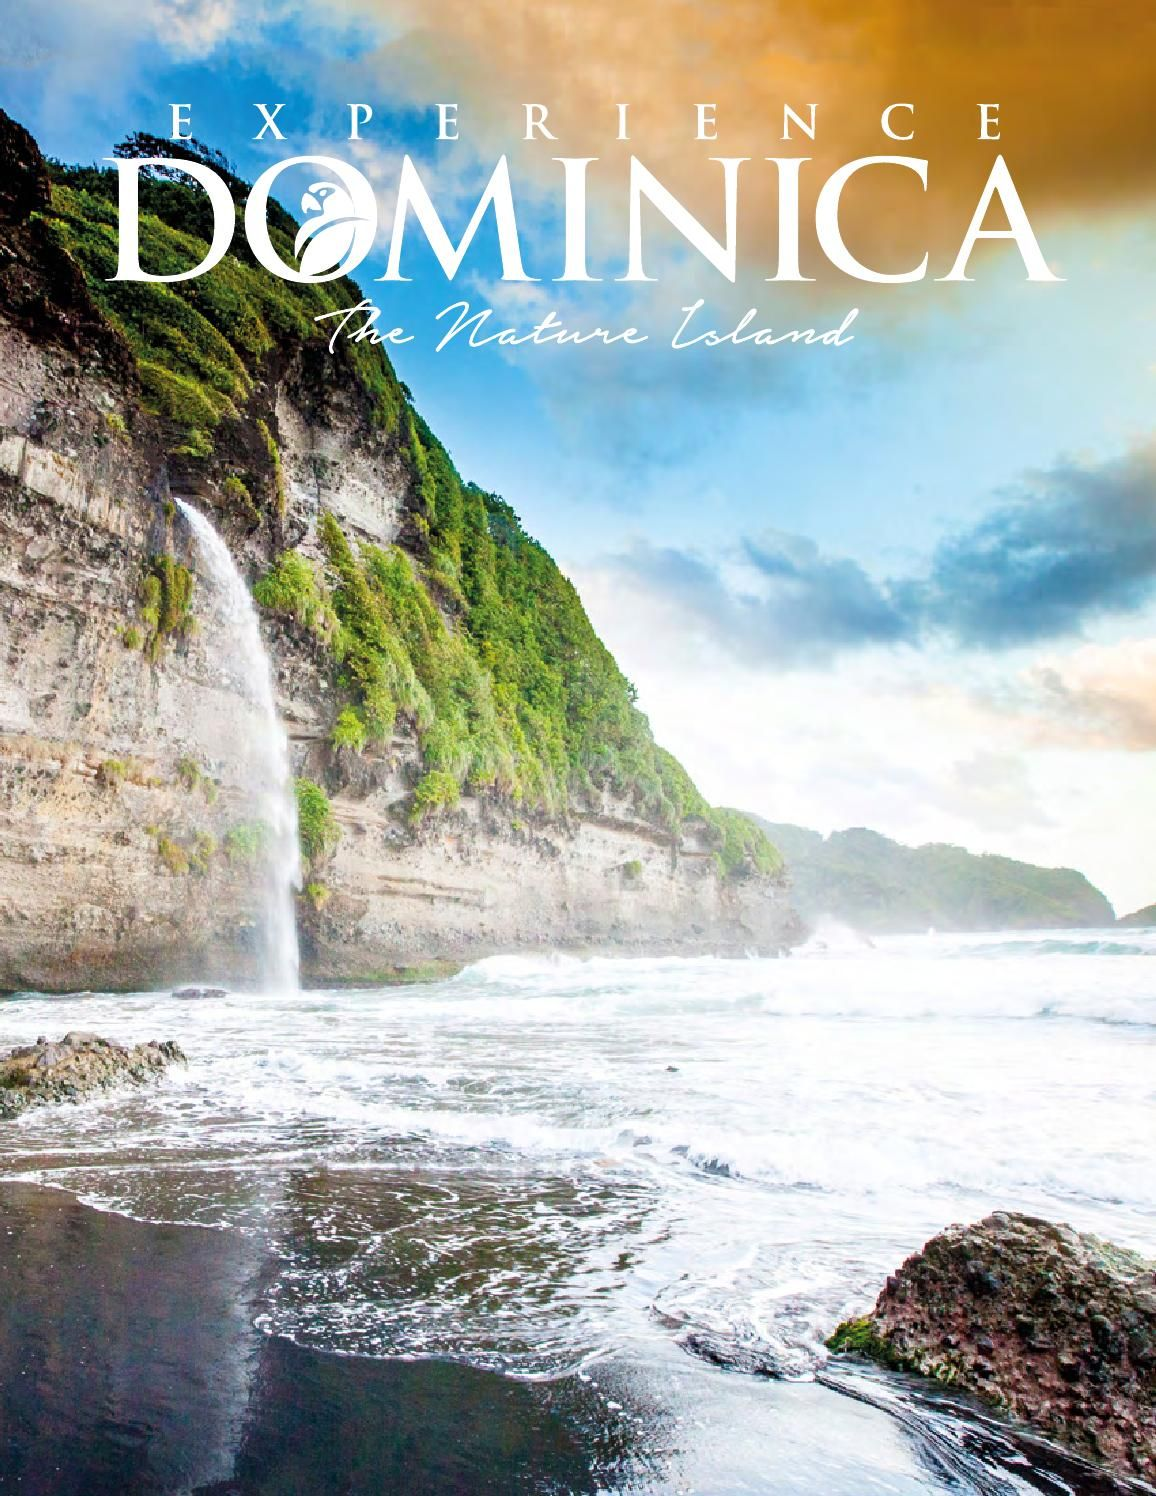 Experience Dominca 2016 Nature, Travel, Island